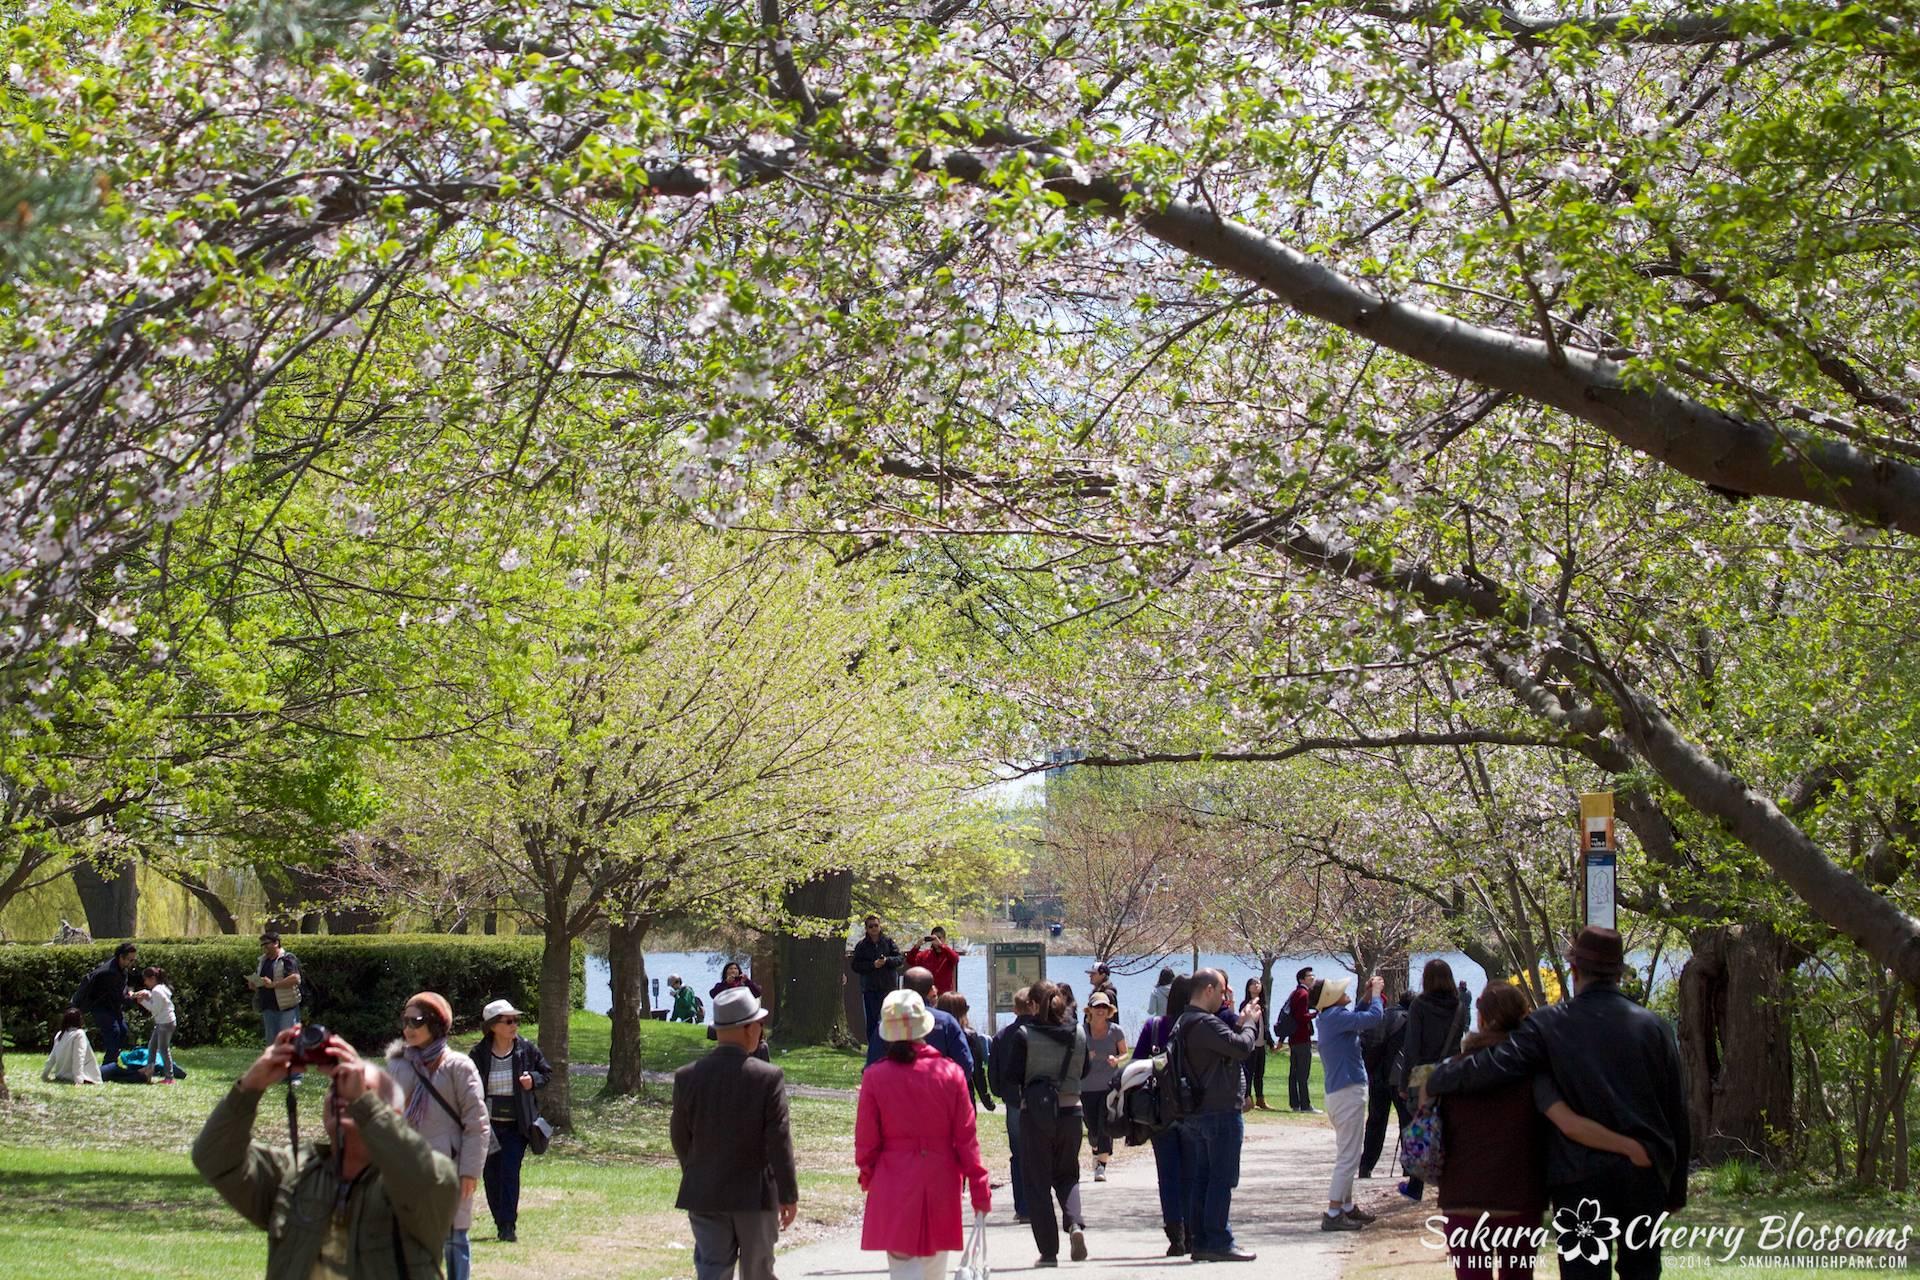 SakuraInHighPark-May1614-568.jpg